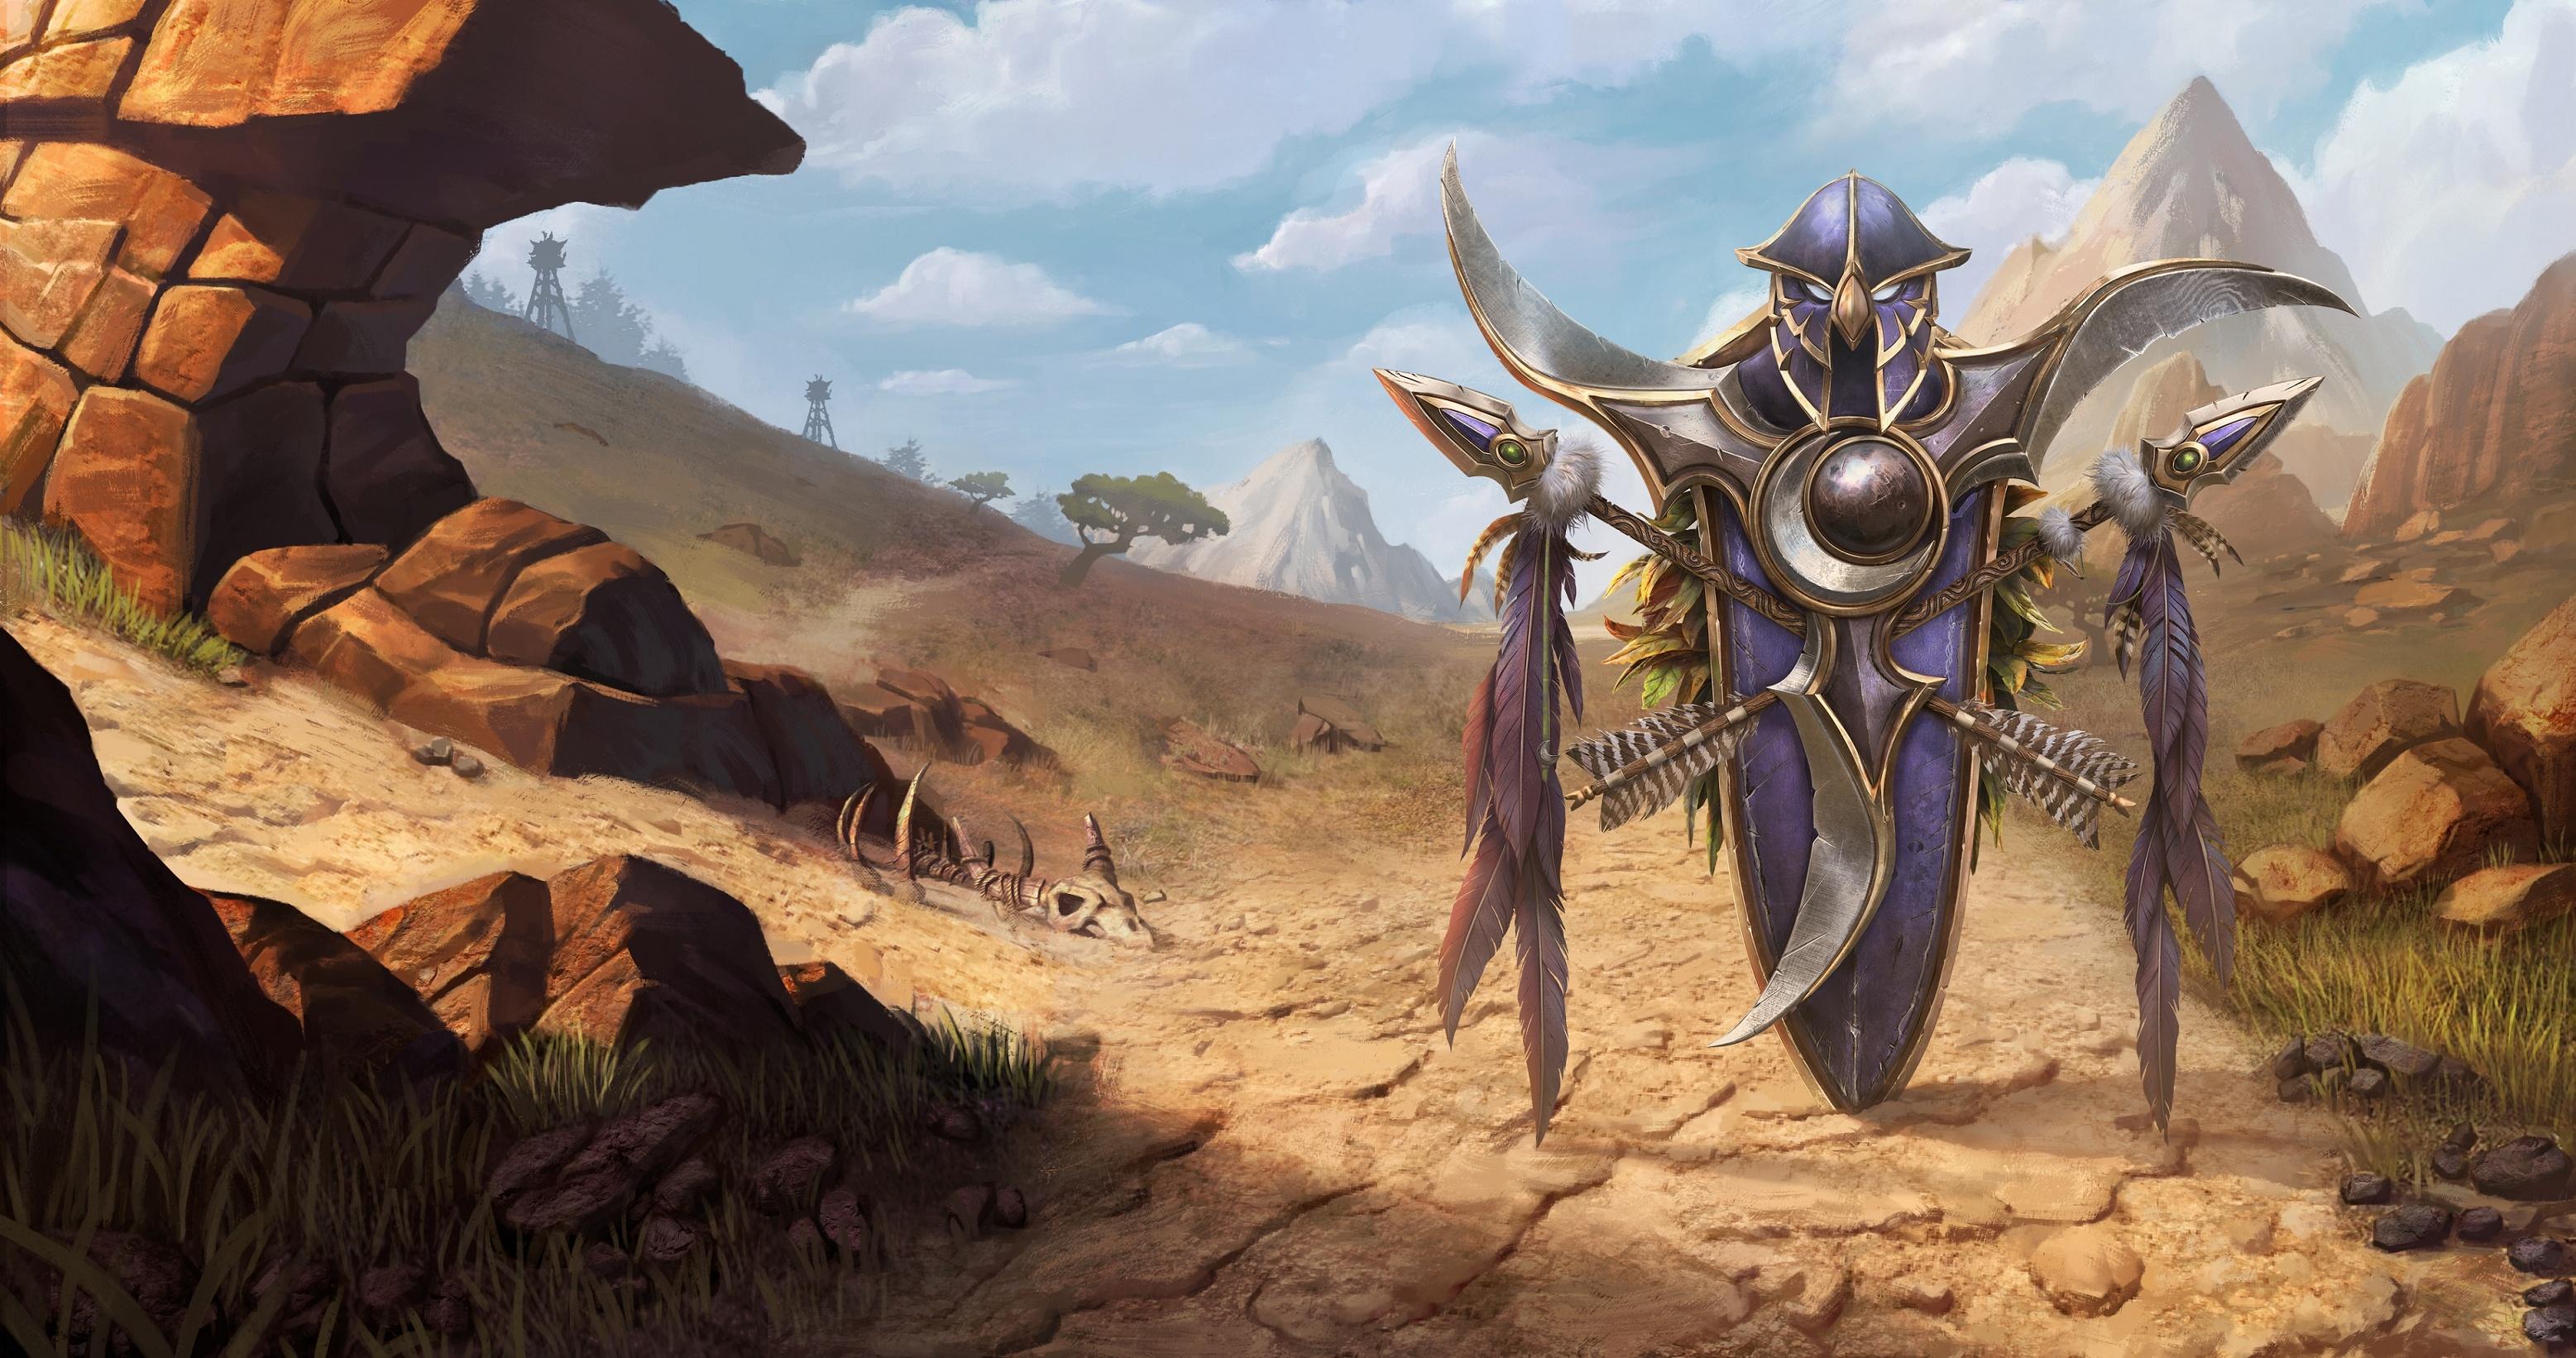 Warcraft III Reforged Art Assets - Loading Screens